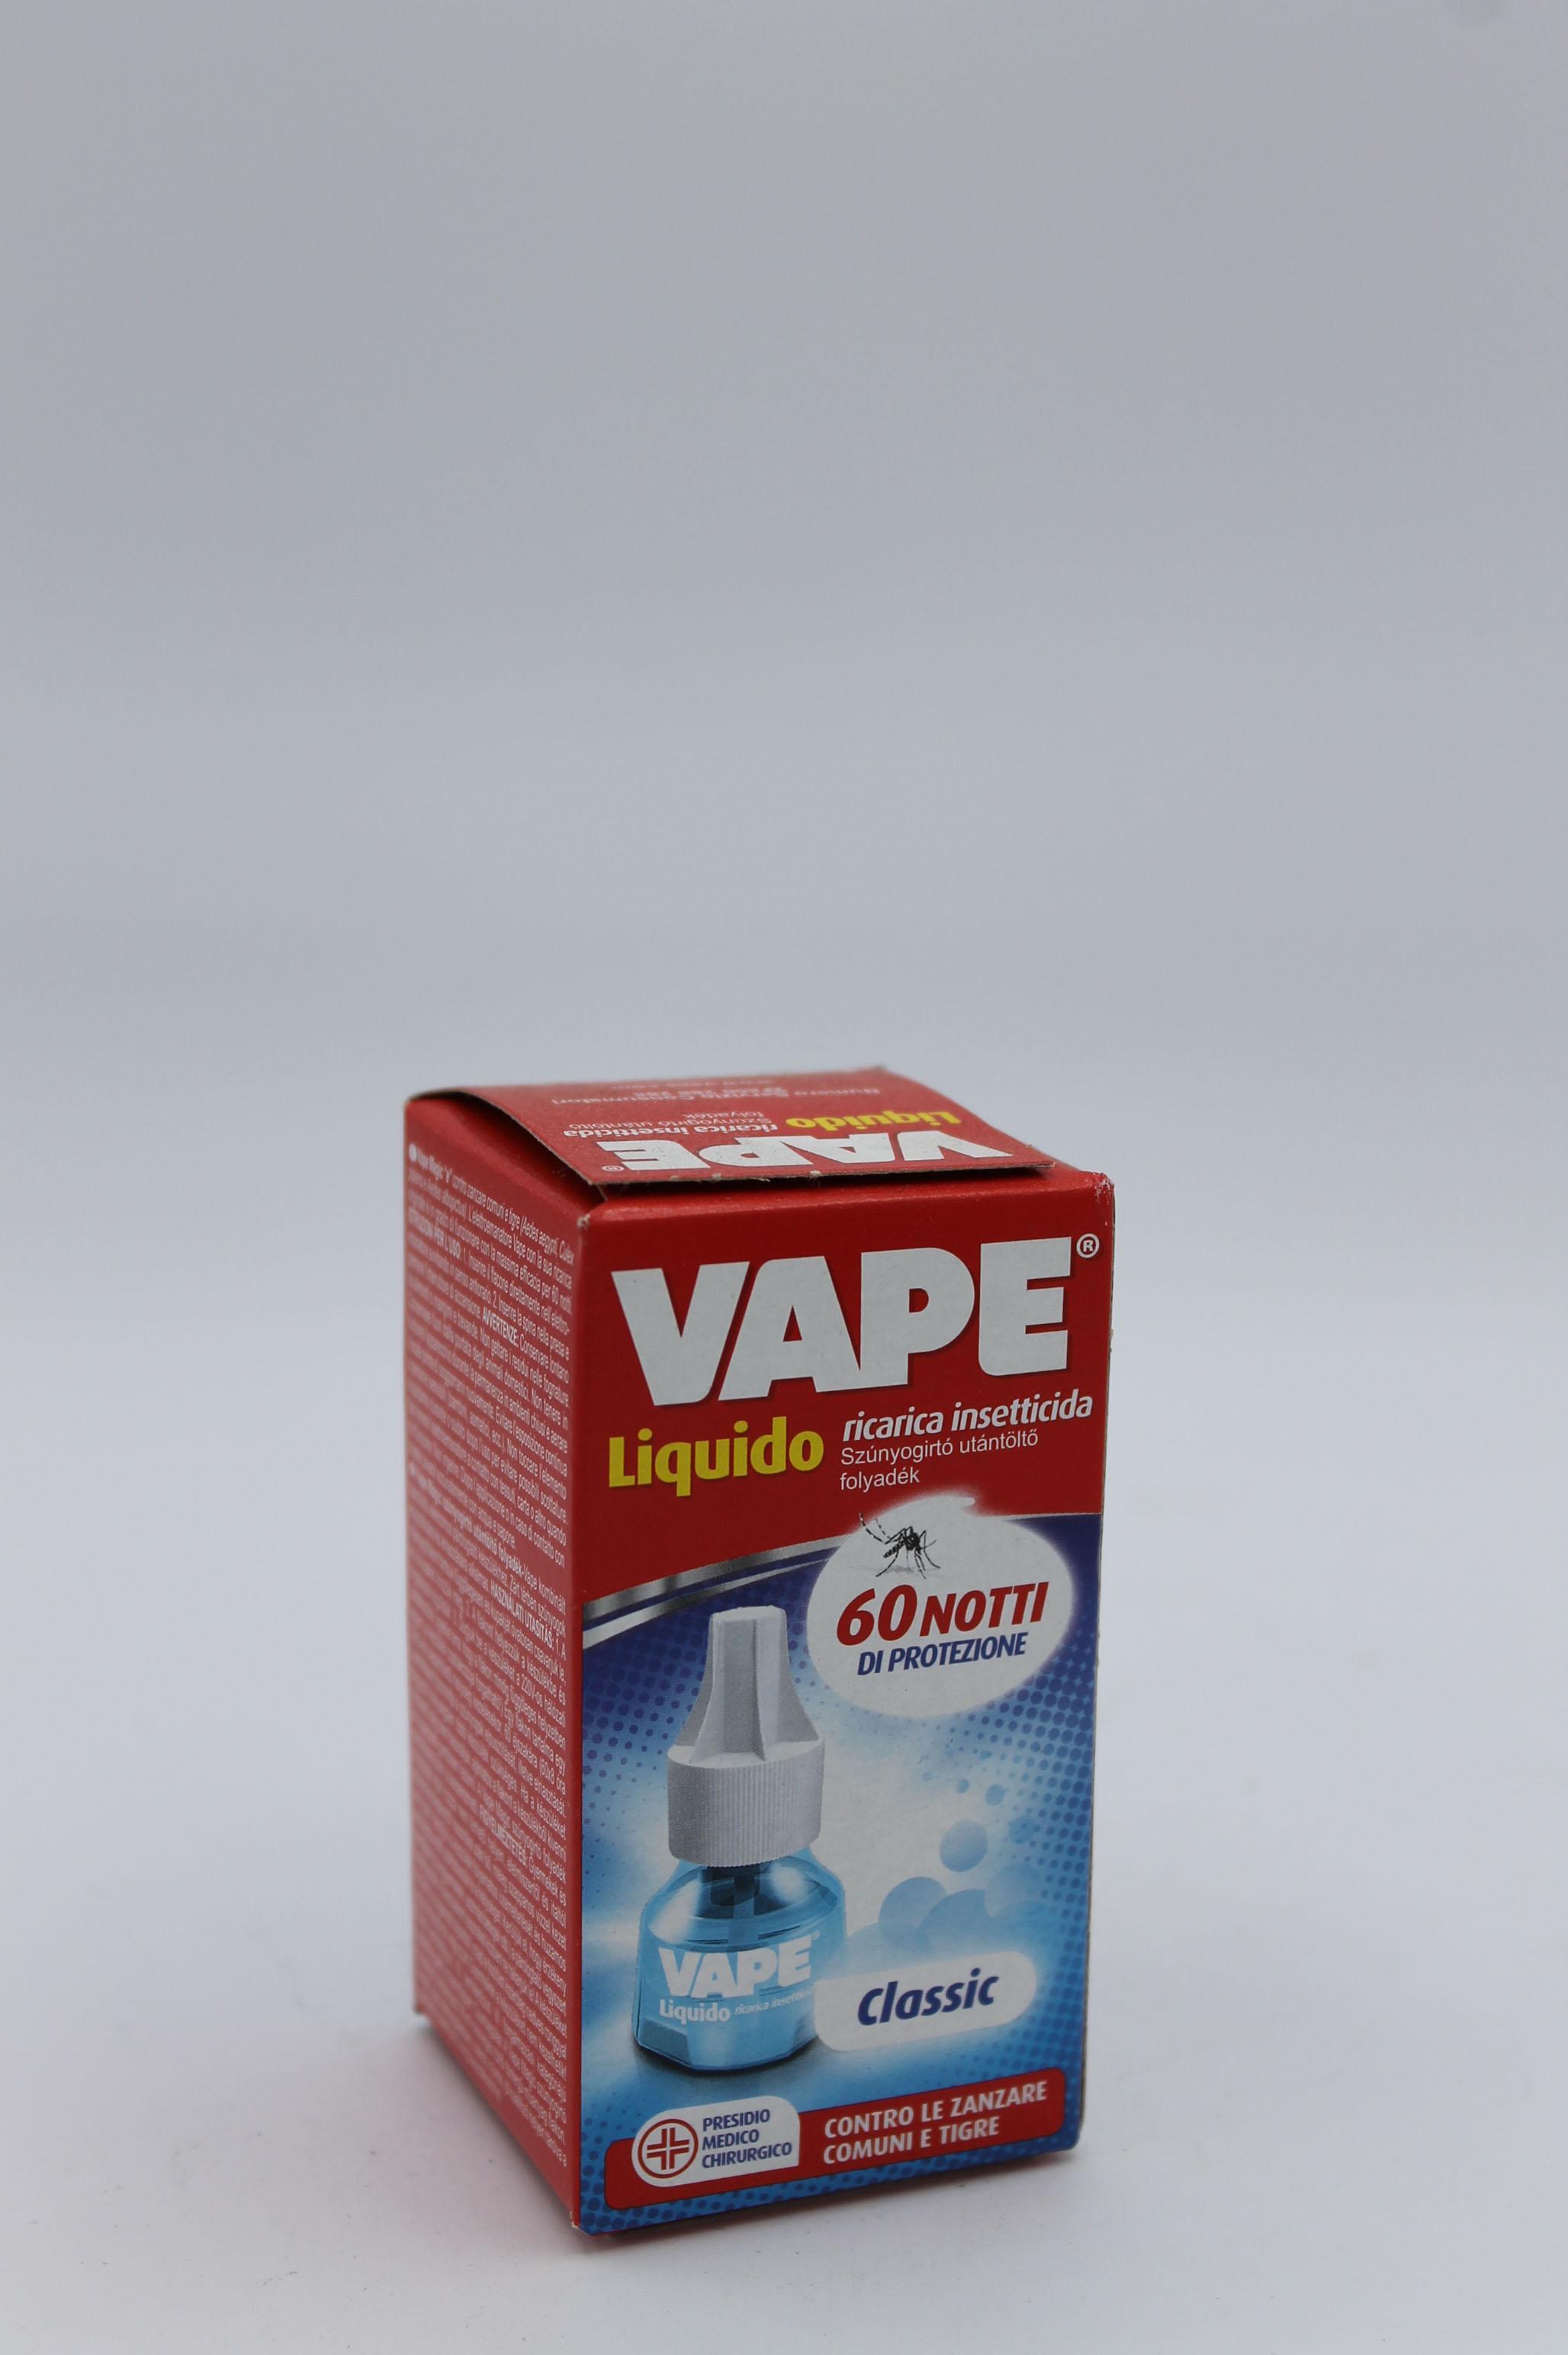 Vape ricarica liquida anti zanzare 1pz.